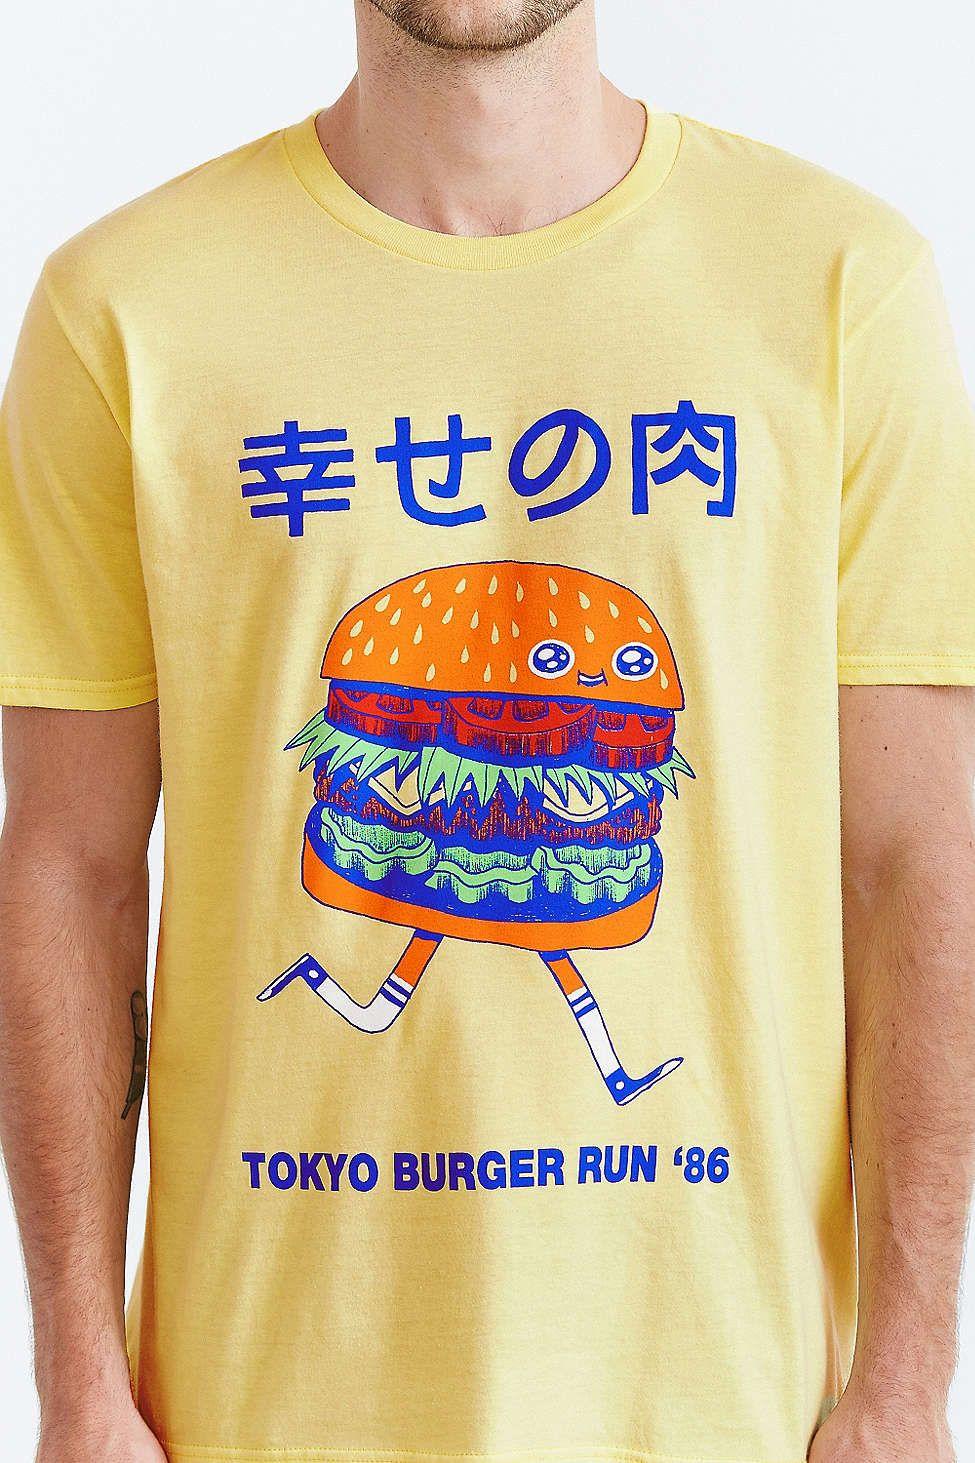 Shirt design killeen tx - Threadless Tokyo Burger Run Tee